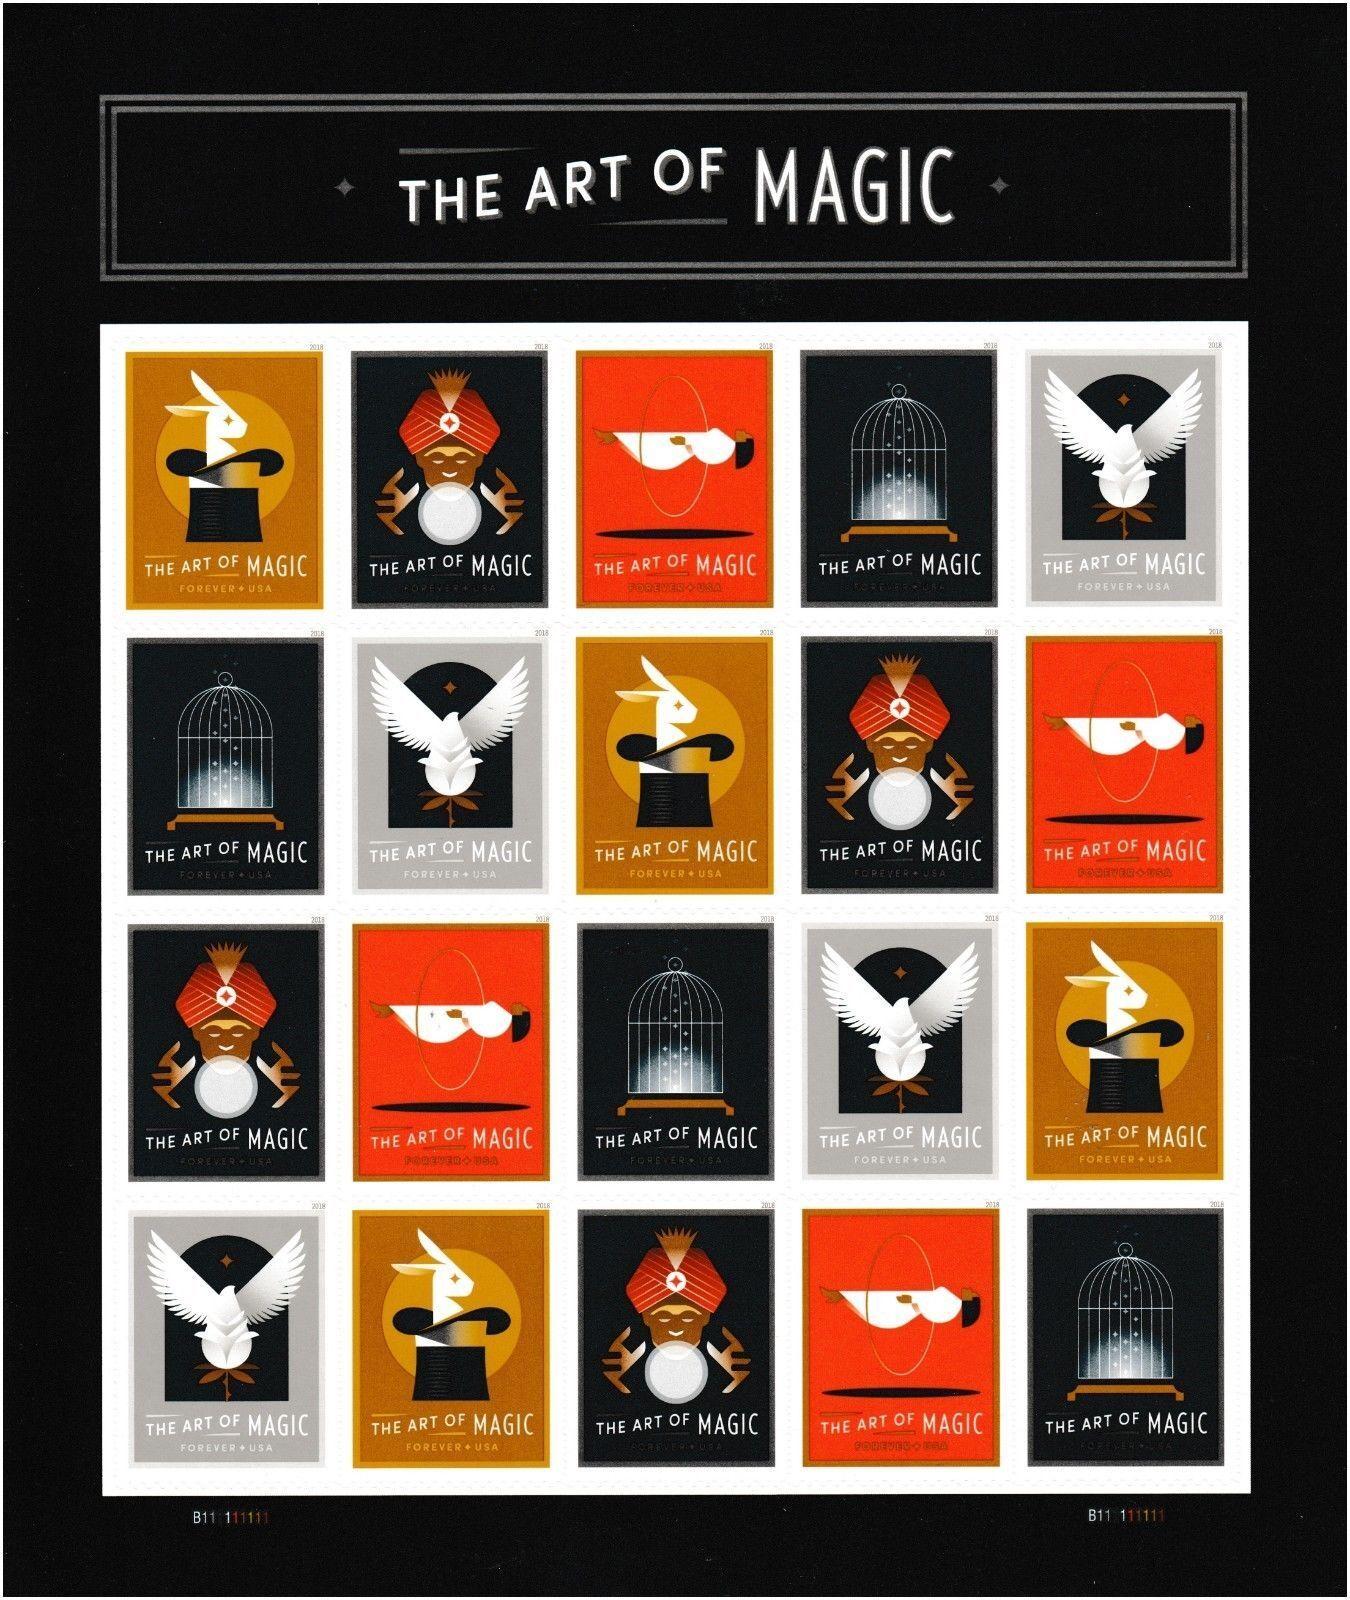 2018 50c The Art of Magic, Sheet of 20 Scott 5301-5305